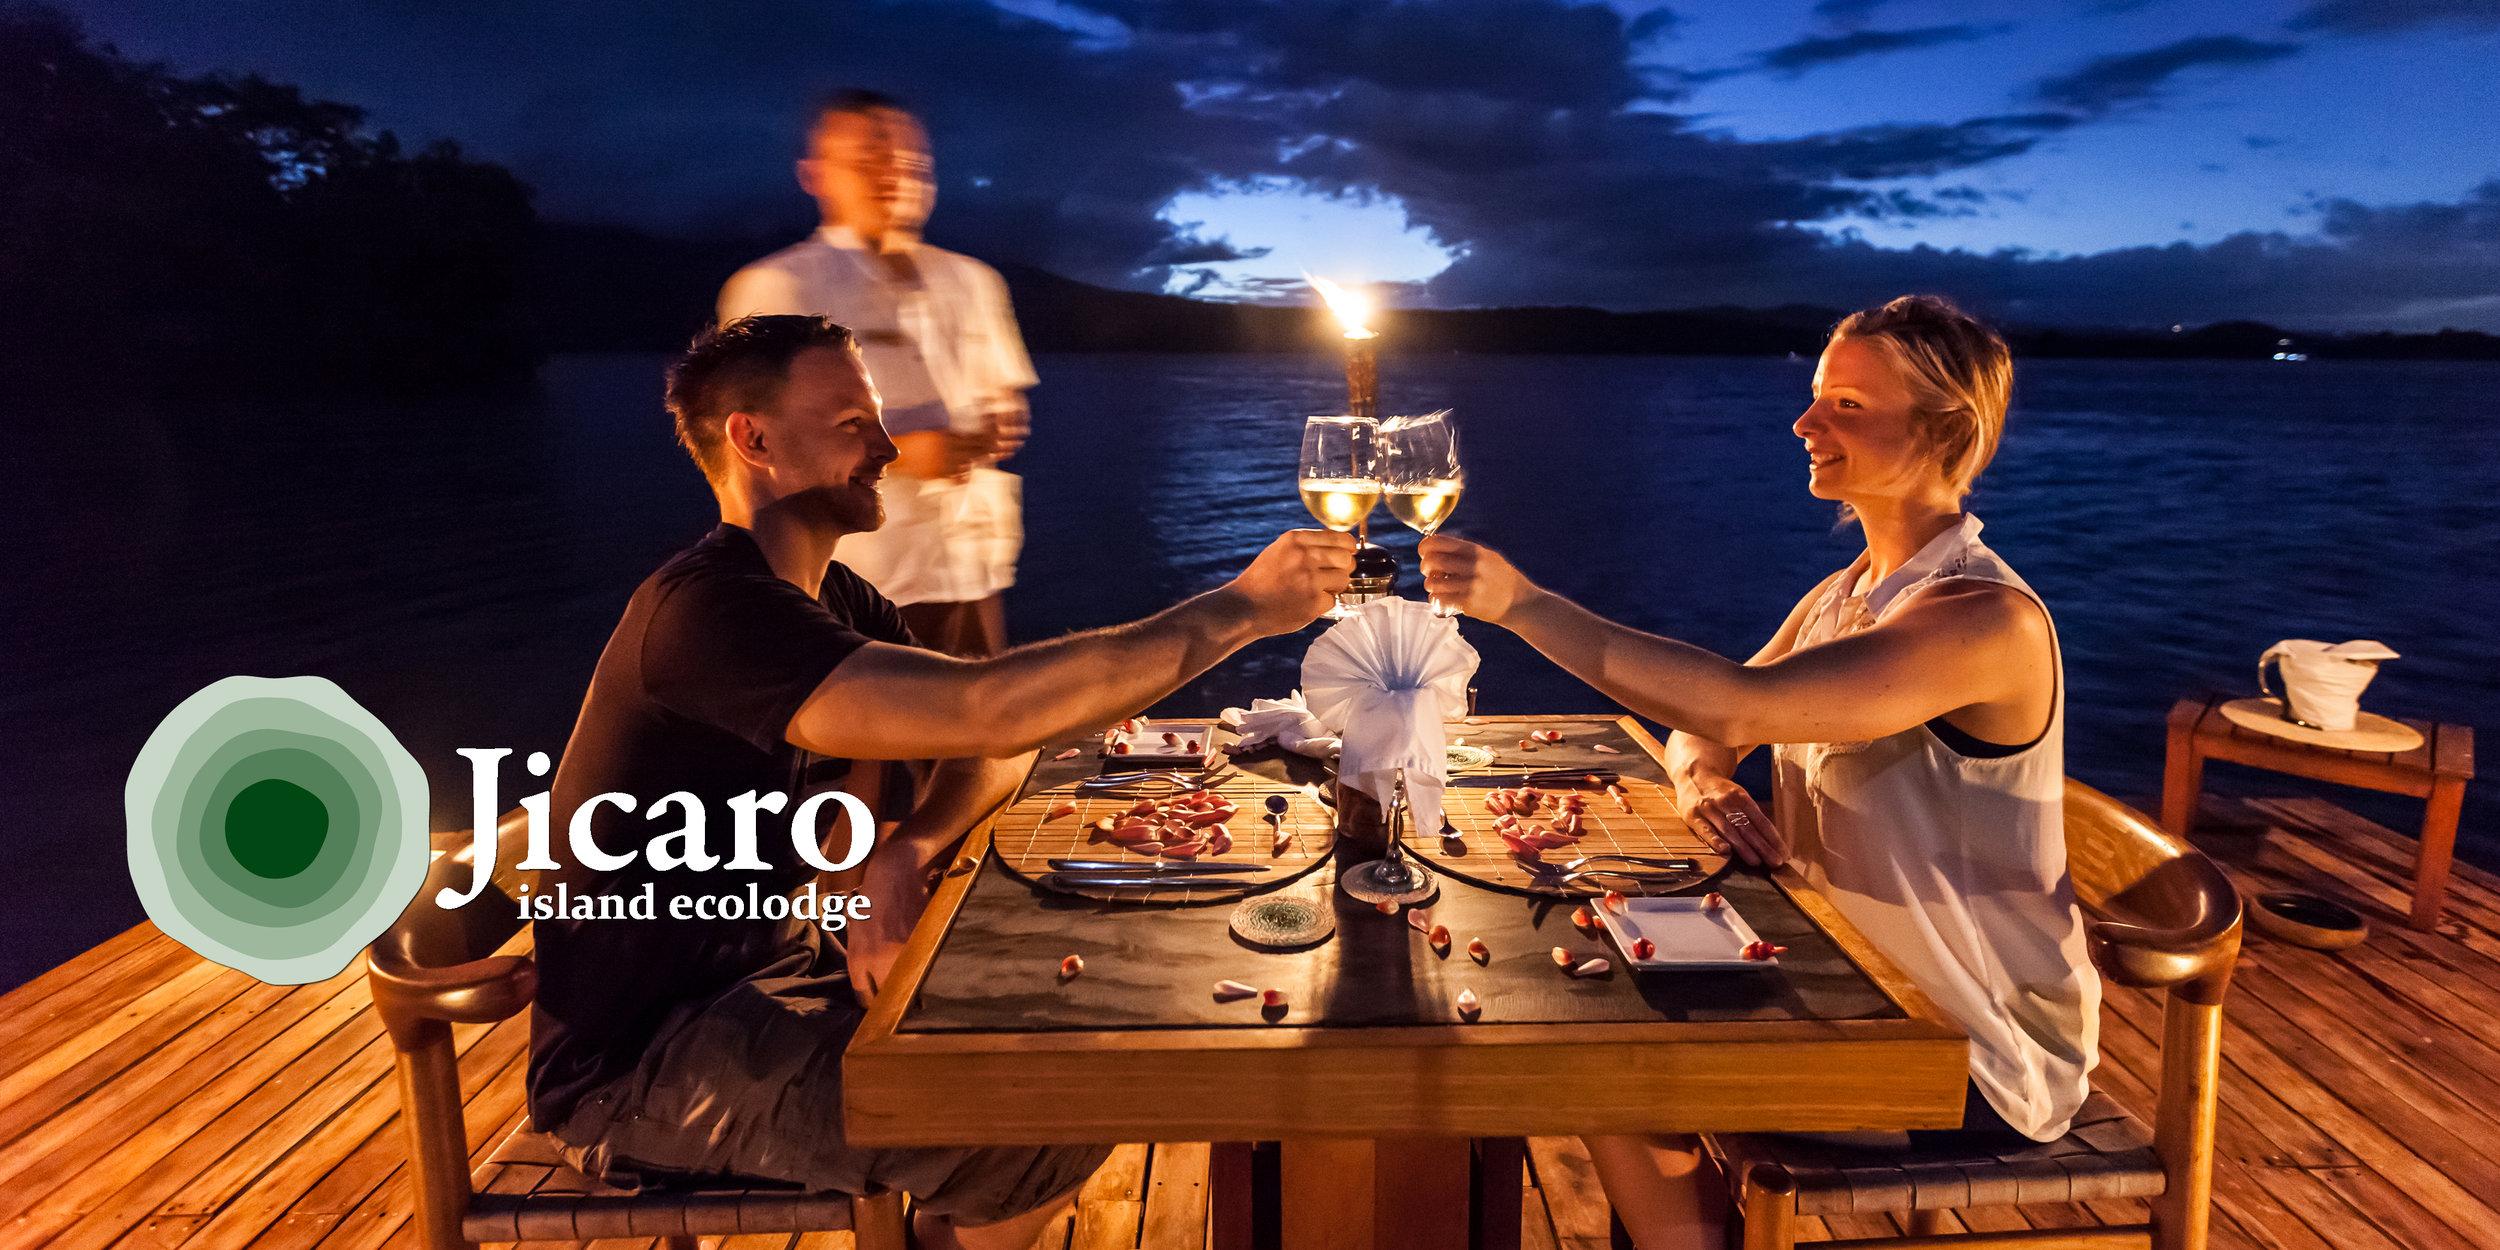 Jicaro Island Web Images 7.jpg